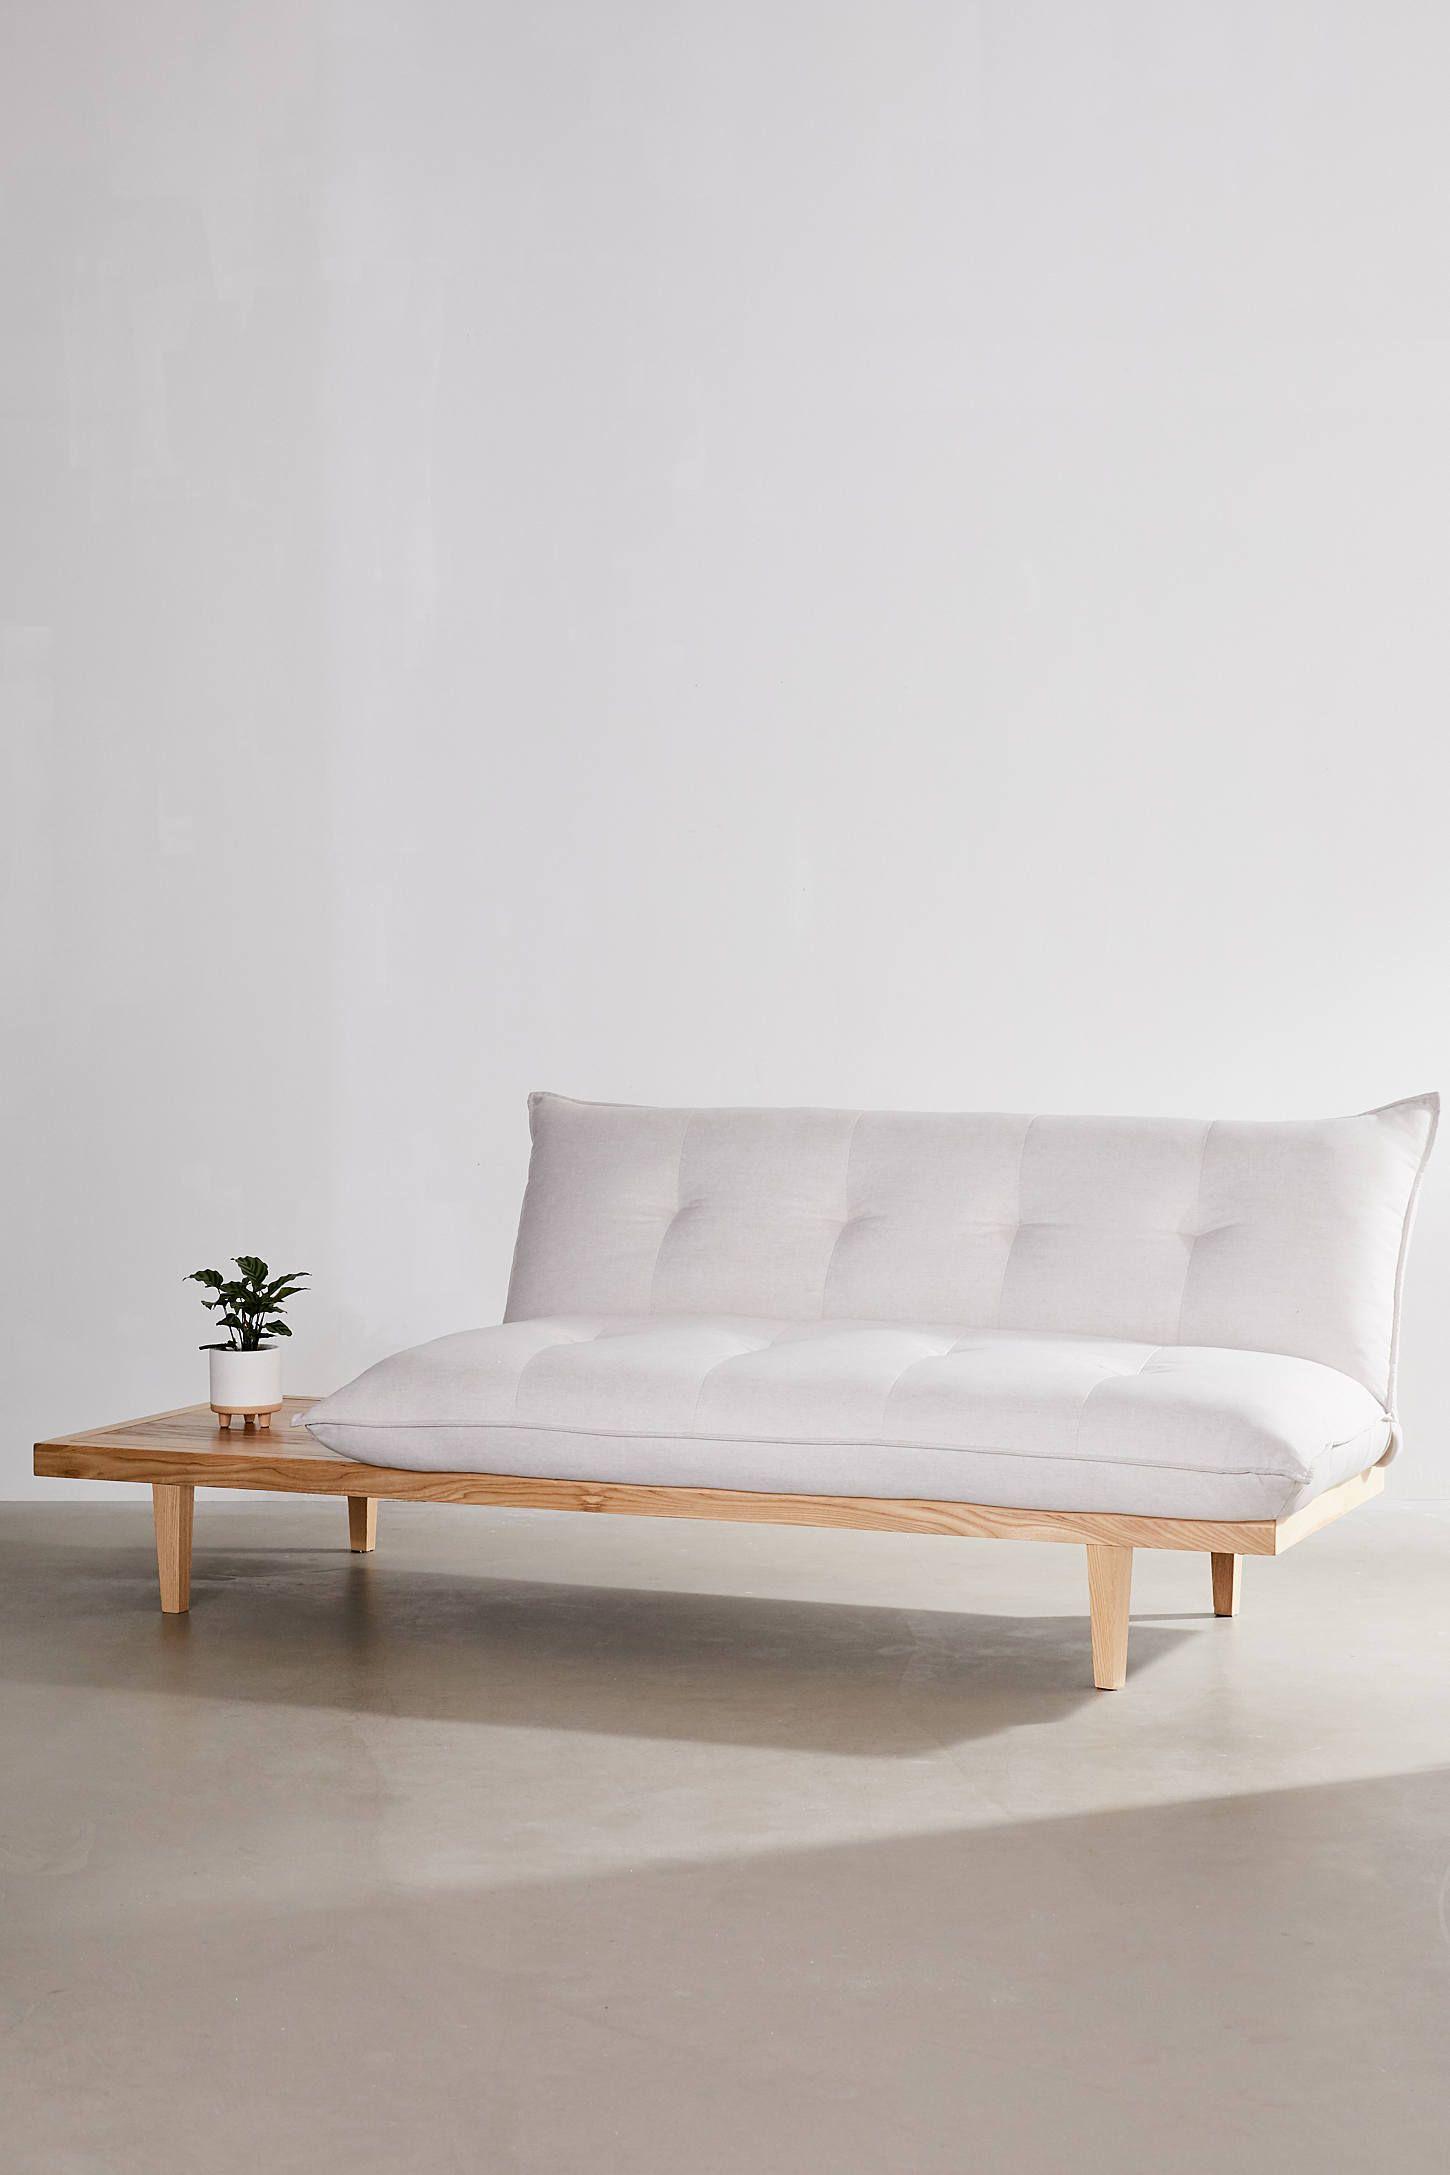 Fine Reid Side Table Convertible Sofa In 2019 Minimalist Machost Co Dining Chair Design Ideas Machostcouk